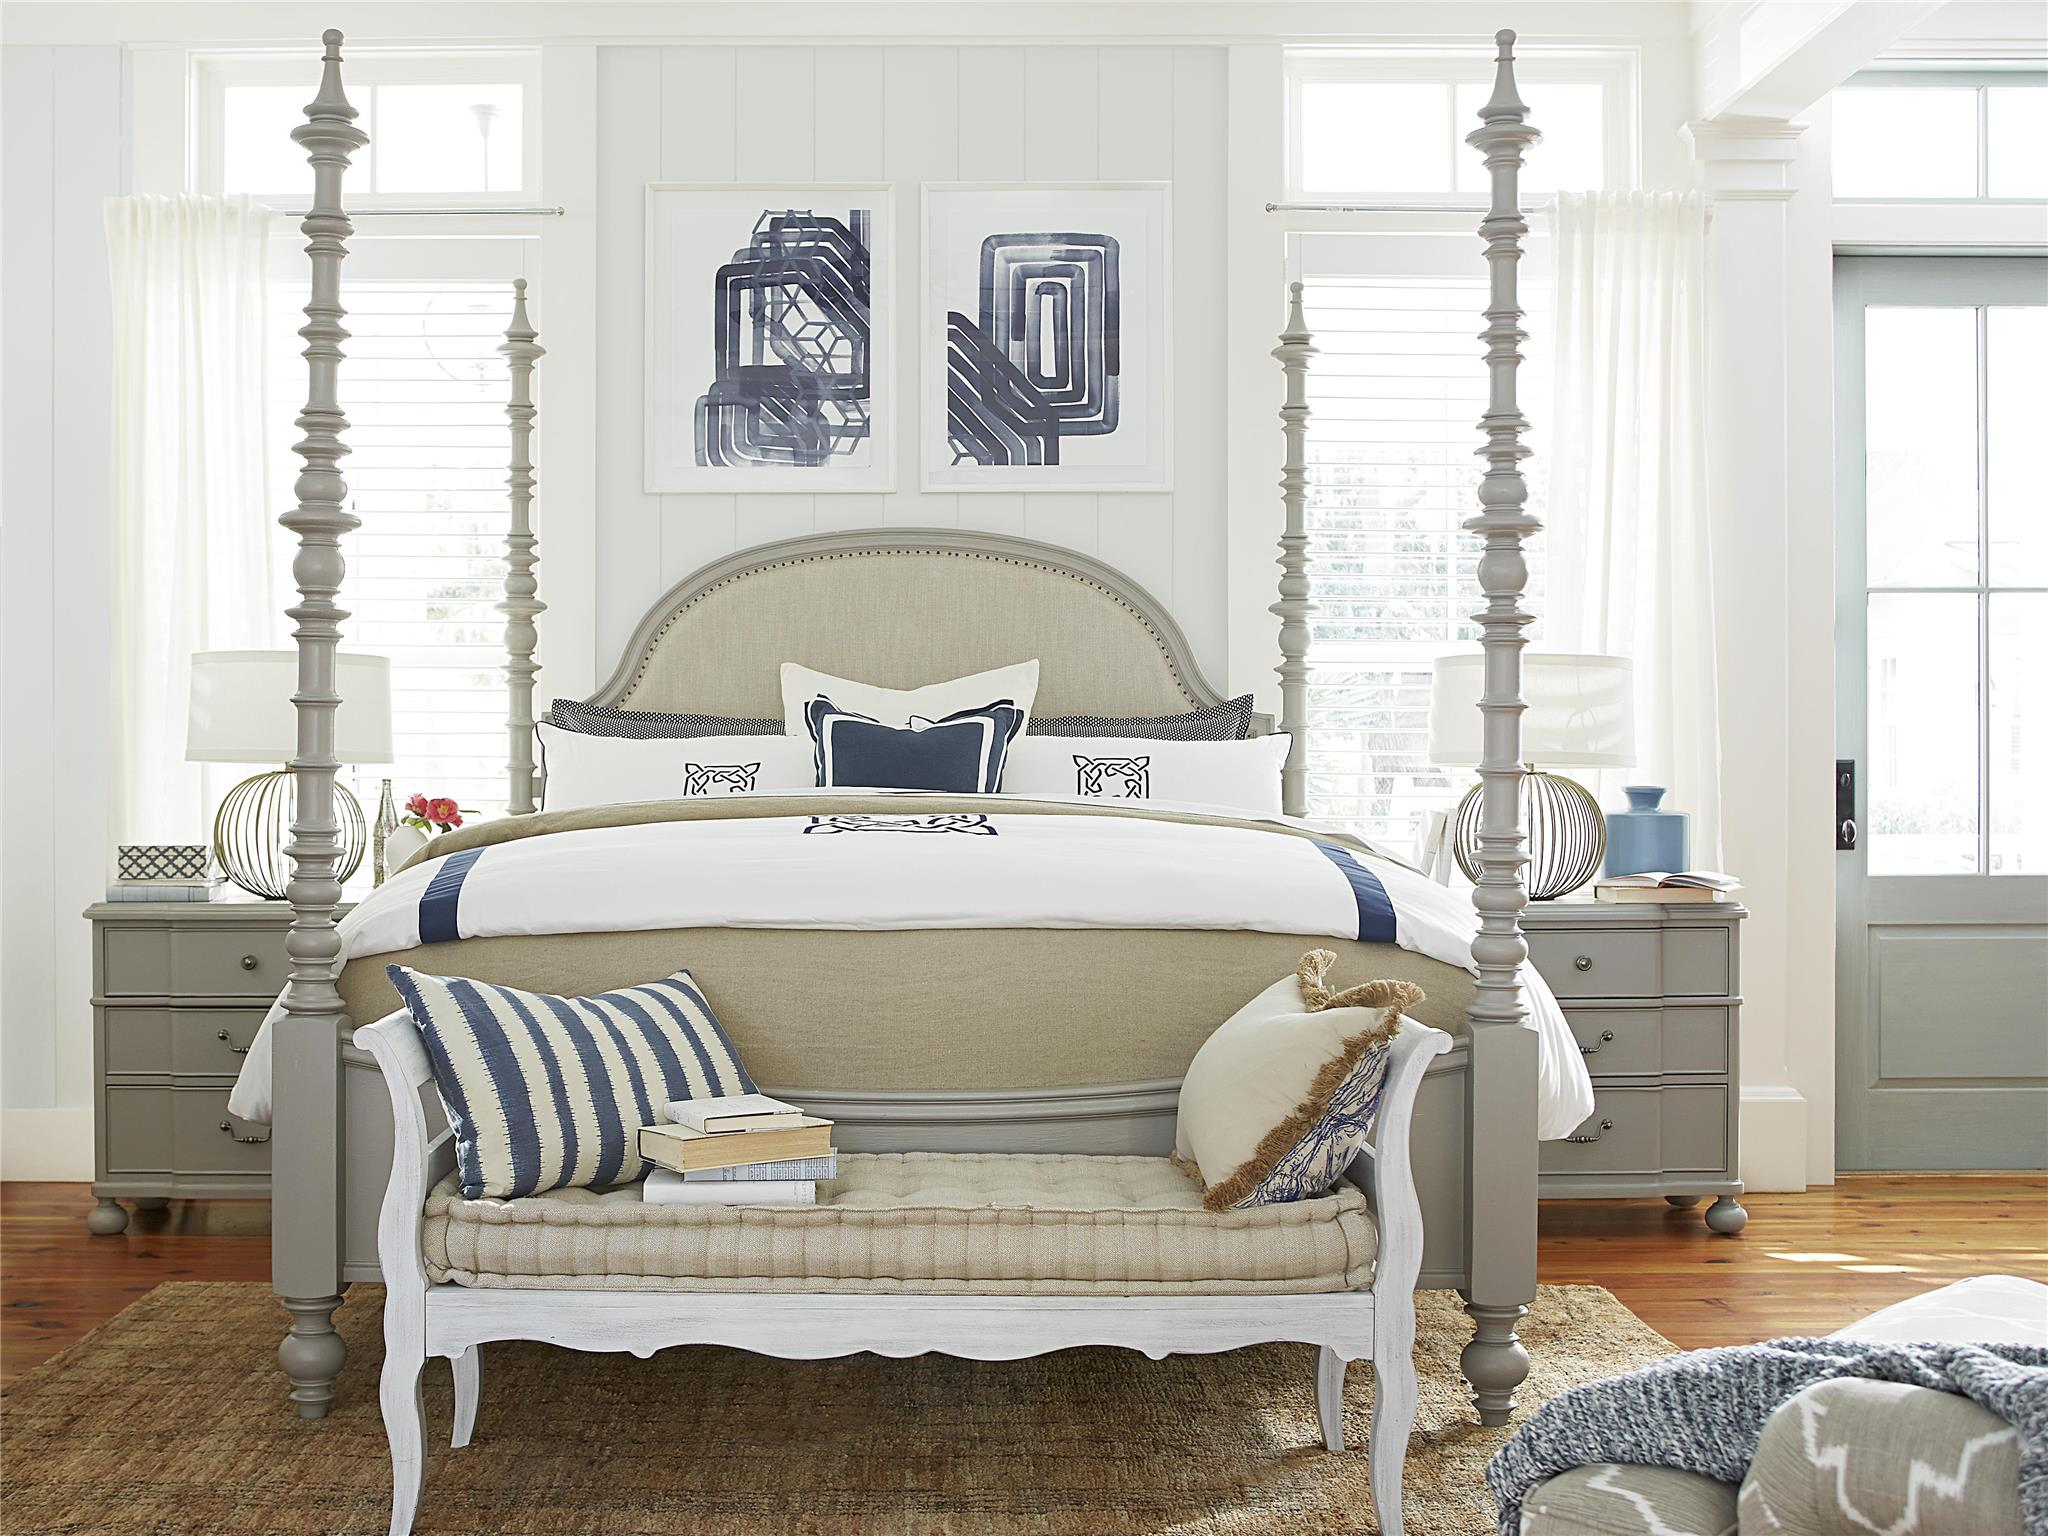 Universal Furniture  DogwoodPaula Deen Home  The